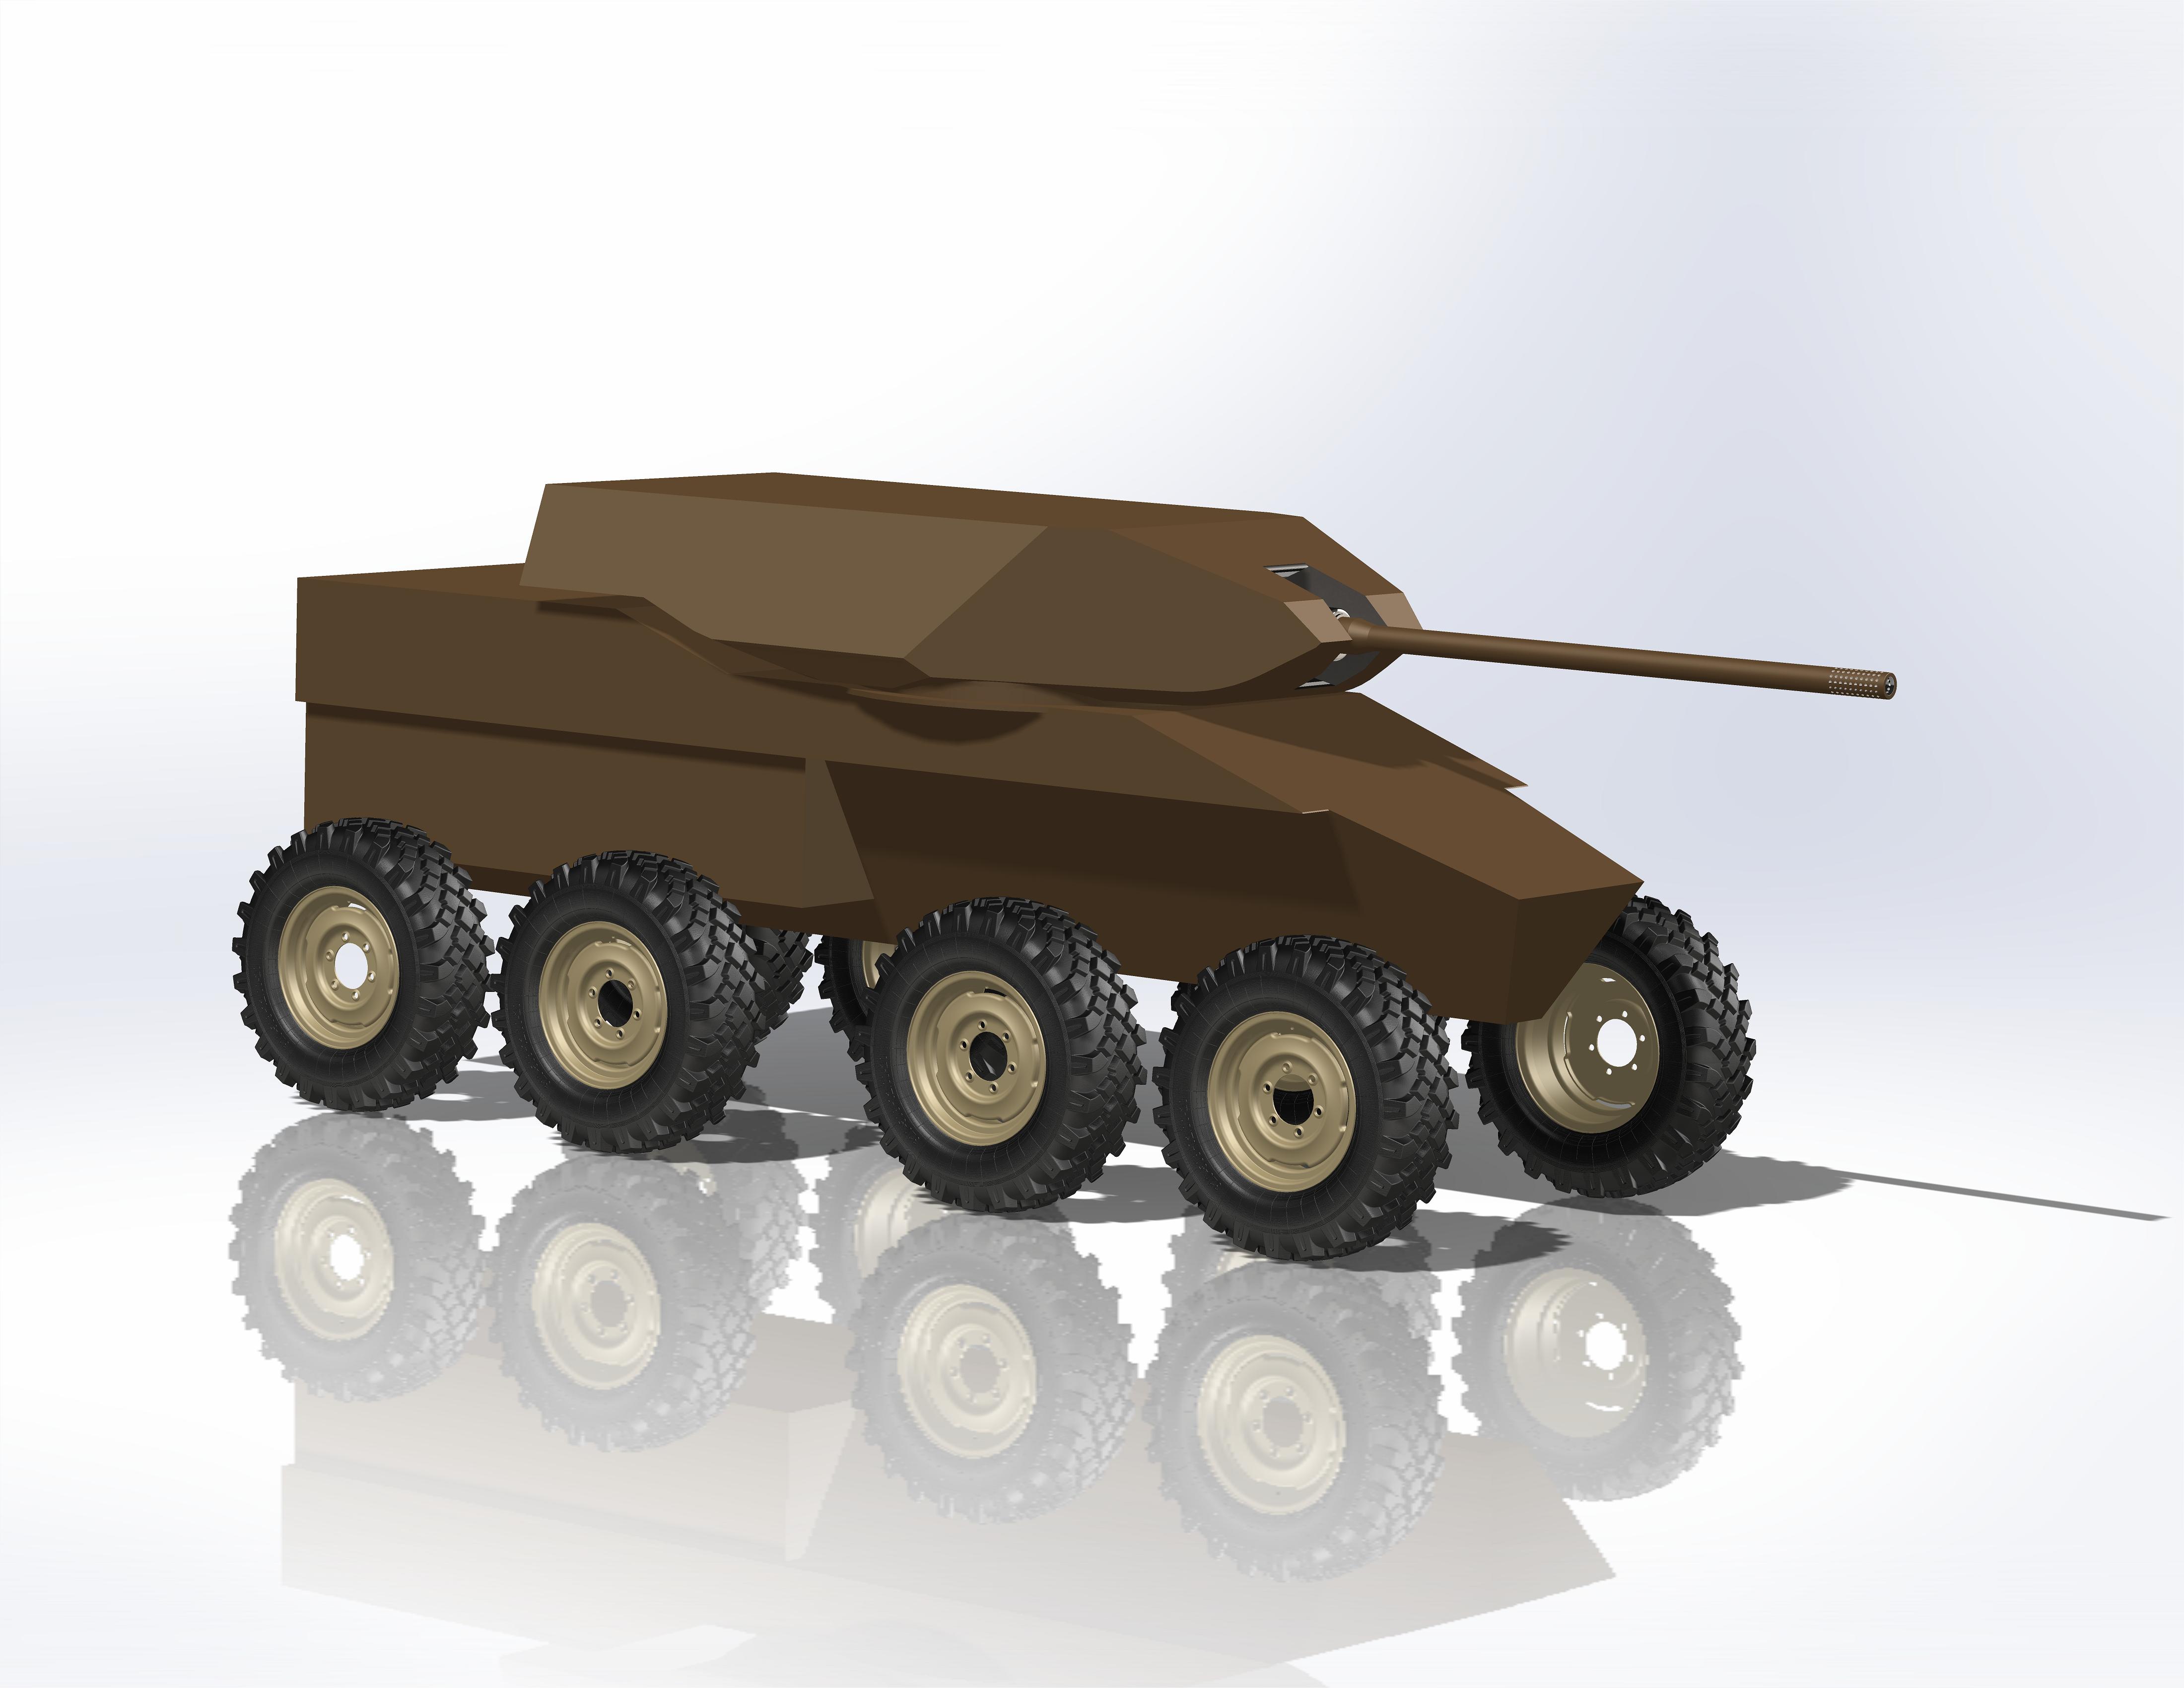 Jaguar_Hull-Turret_Study_w_tires_V5_smal